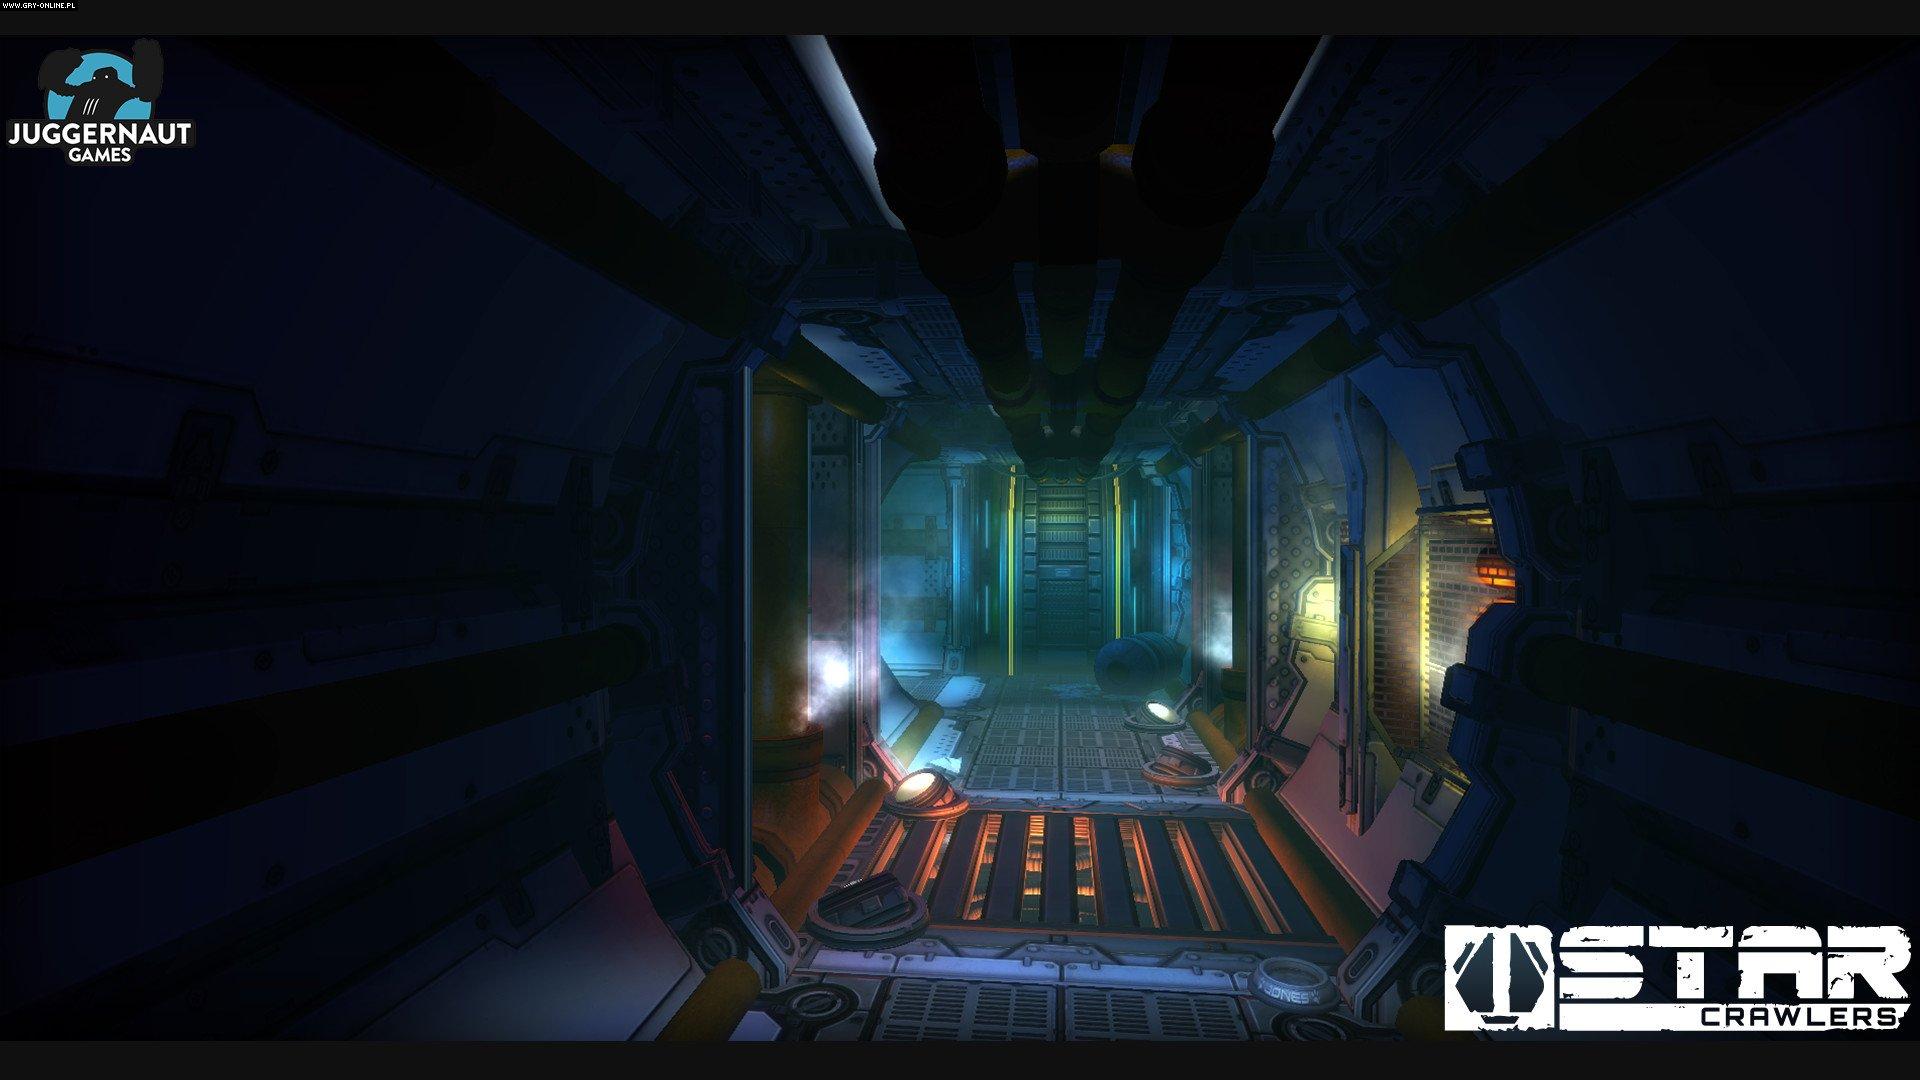 StarCrawlers PC Games Image 7/17, Juggernaut Games